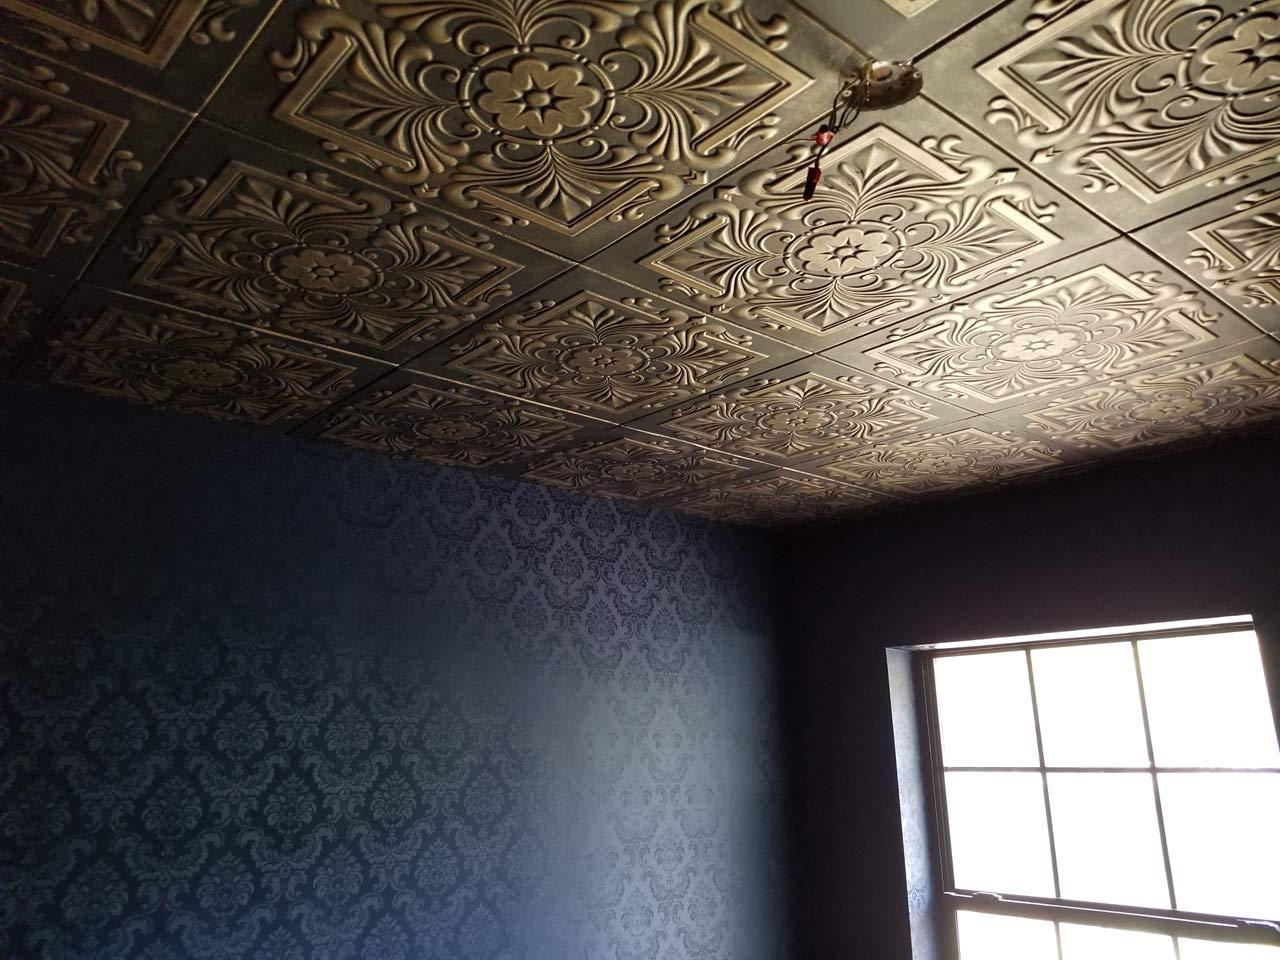 A la Maison Ceilings 1594 Victorian - Styrofoam Ceiling Tile (Package of 8 Tiles), Plain White